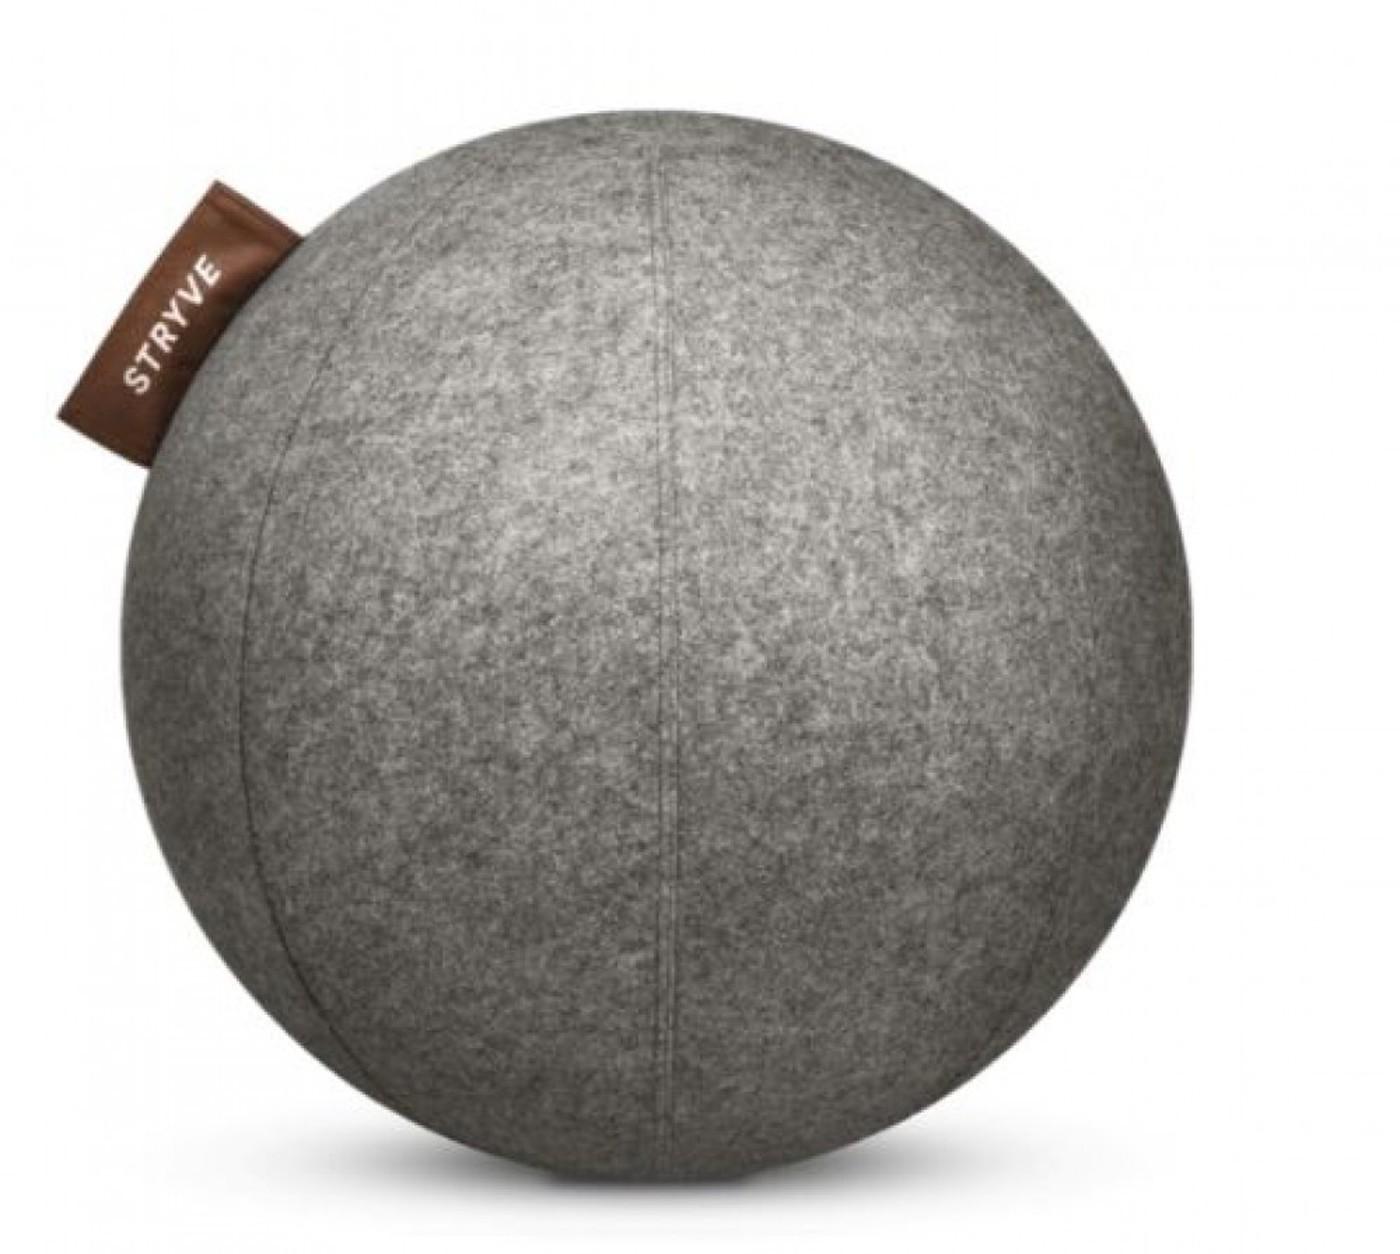 STRYVE Acive Ball Wollfilz